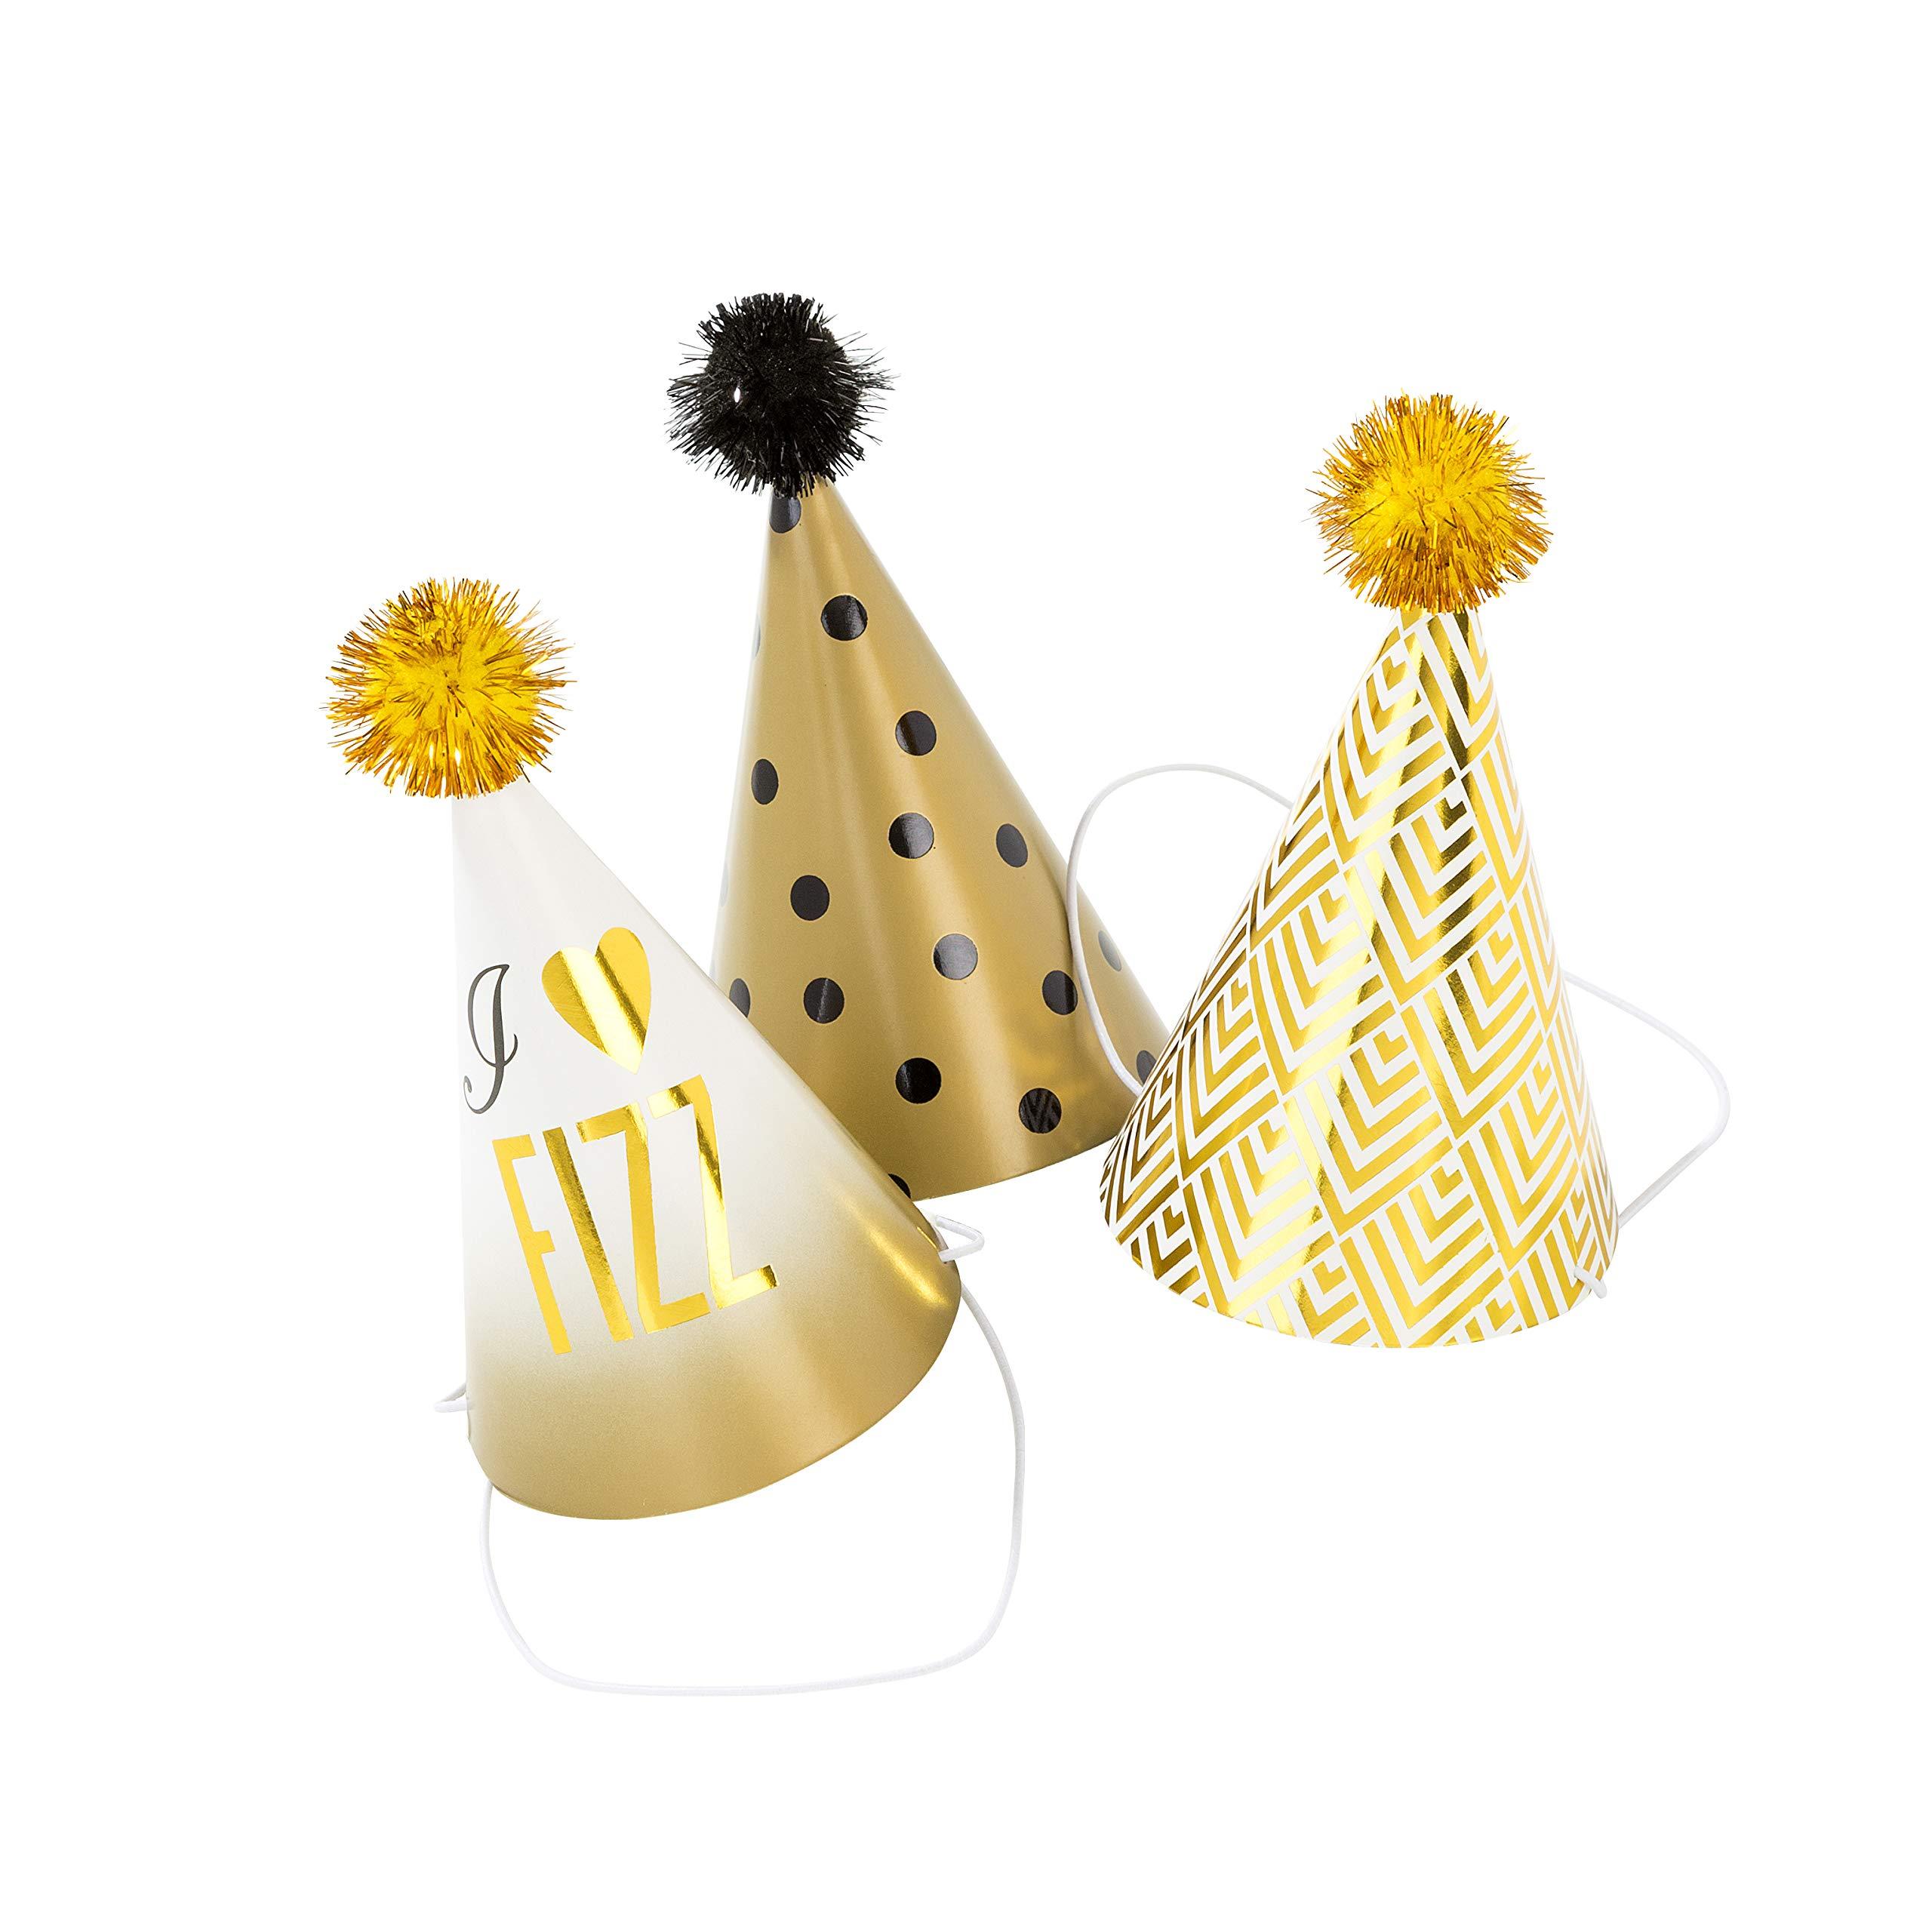 Talking Tables GLIT-GME-Name Glitterati Mini Party Hats and Game PK6, Multicolor